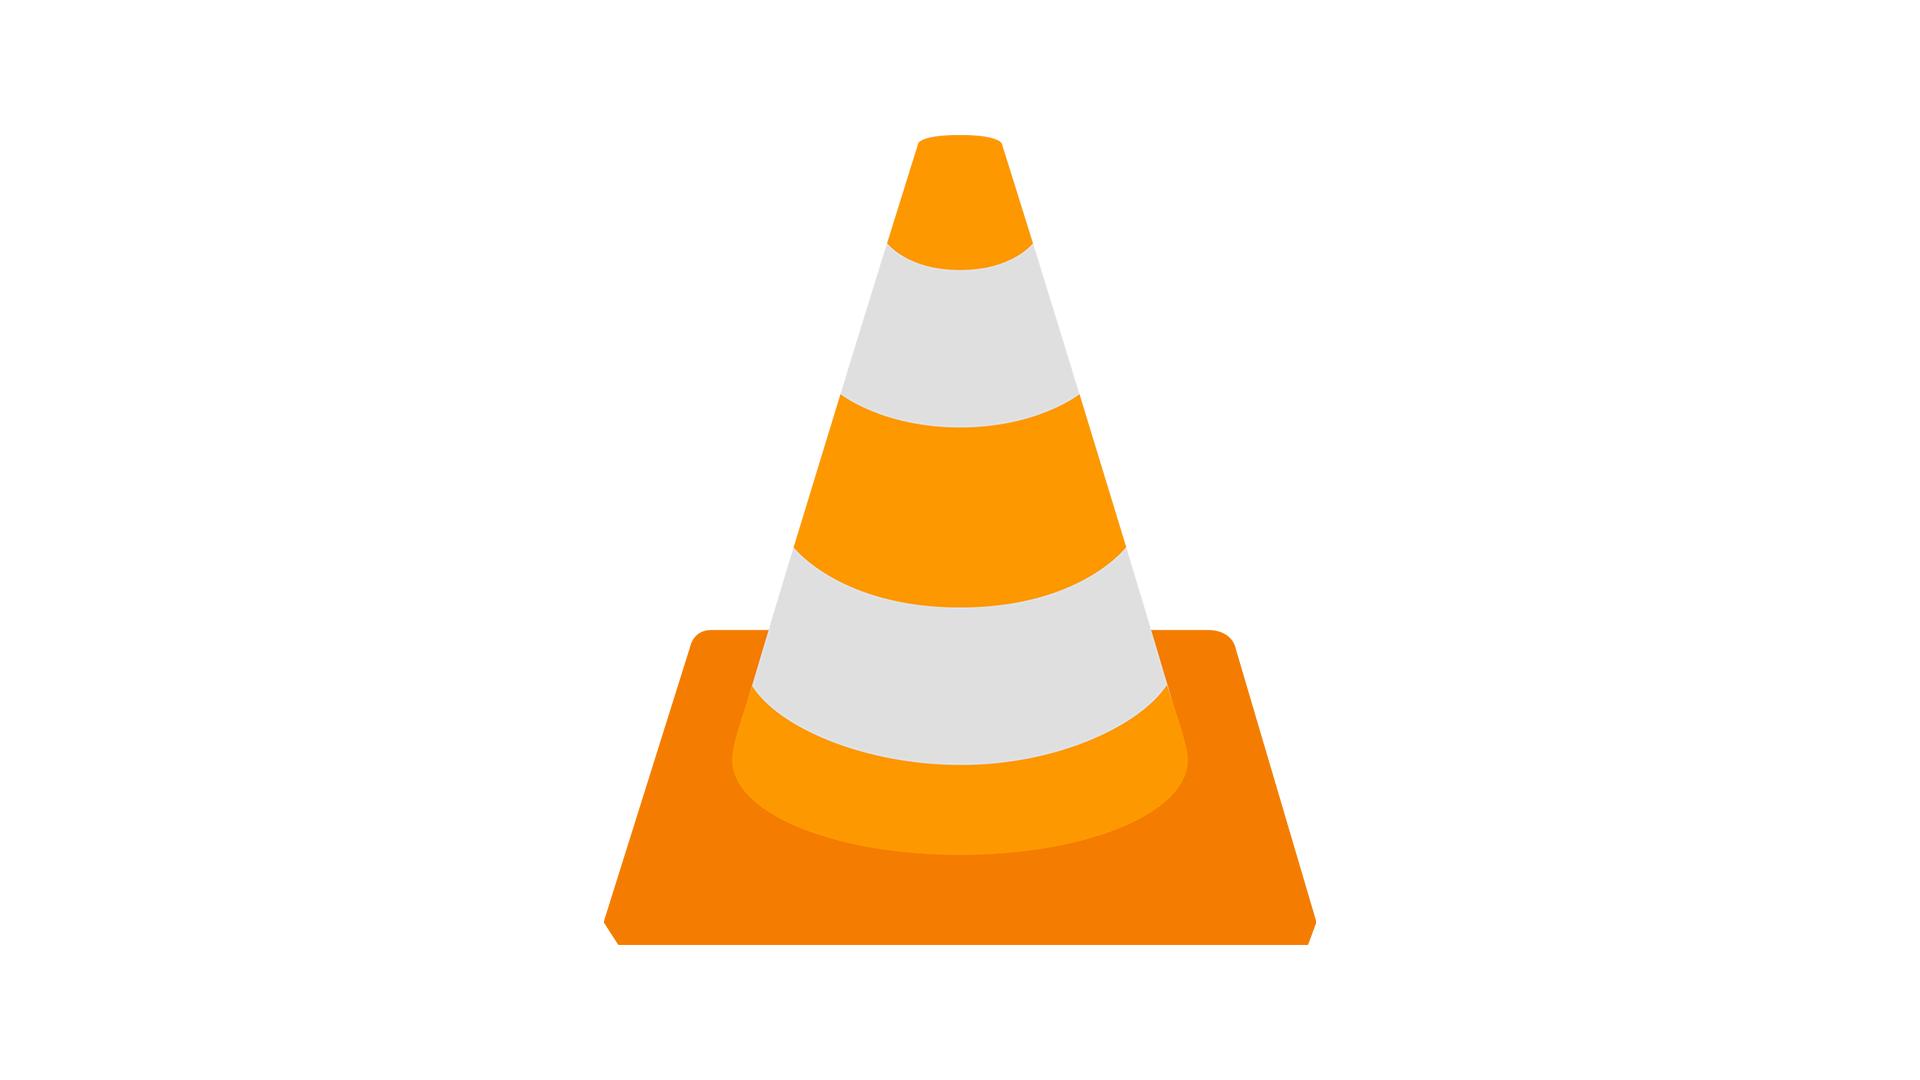 VLC-Player bekommt bald neue Oberfläche - VideoLAN plant Moviepedia - WinFuture